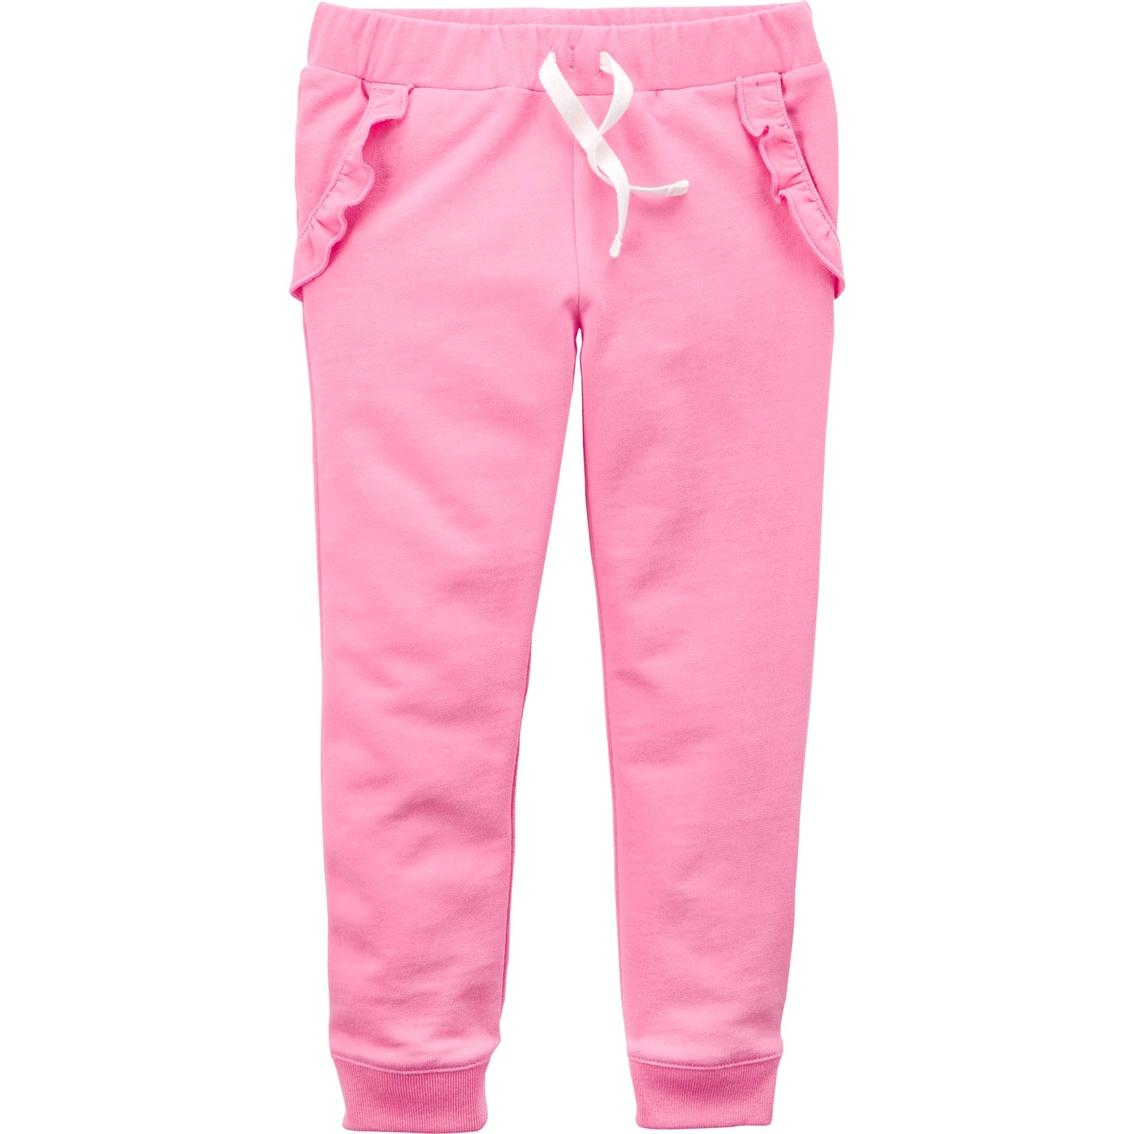 da3f50938 Carter's Toddler Girls Ruffle Pocket Jogger Pants   Toddler Girls 2t ...